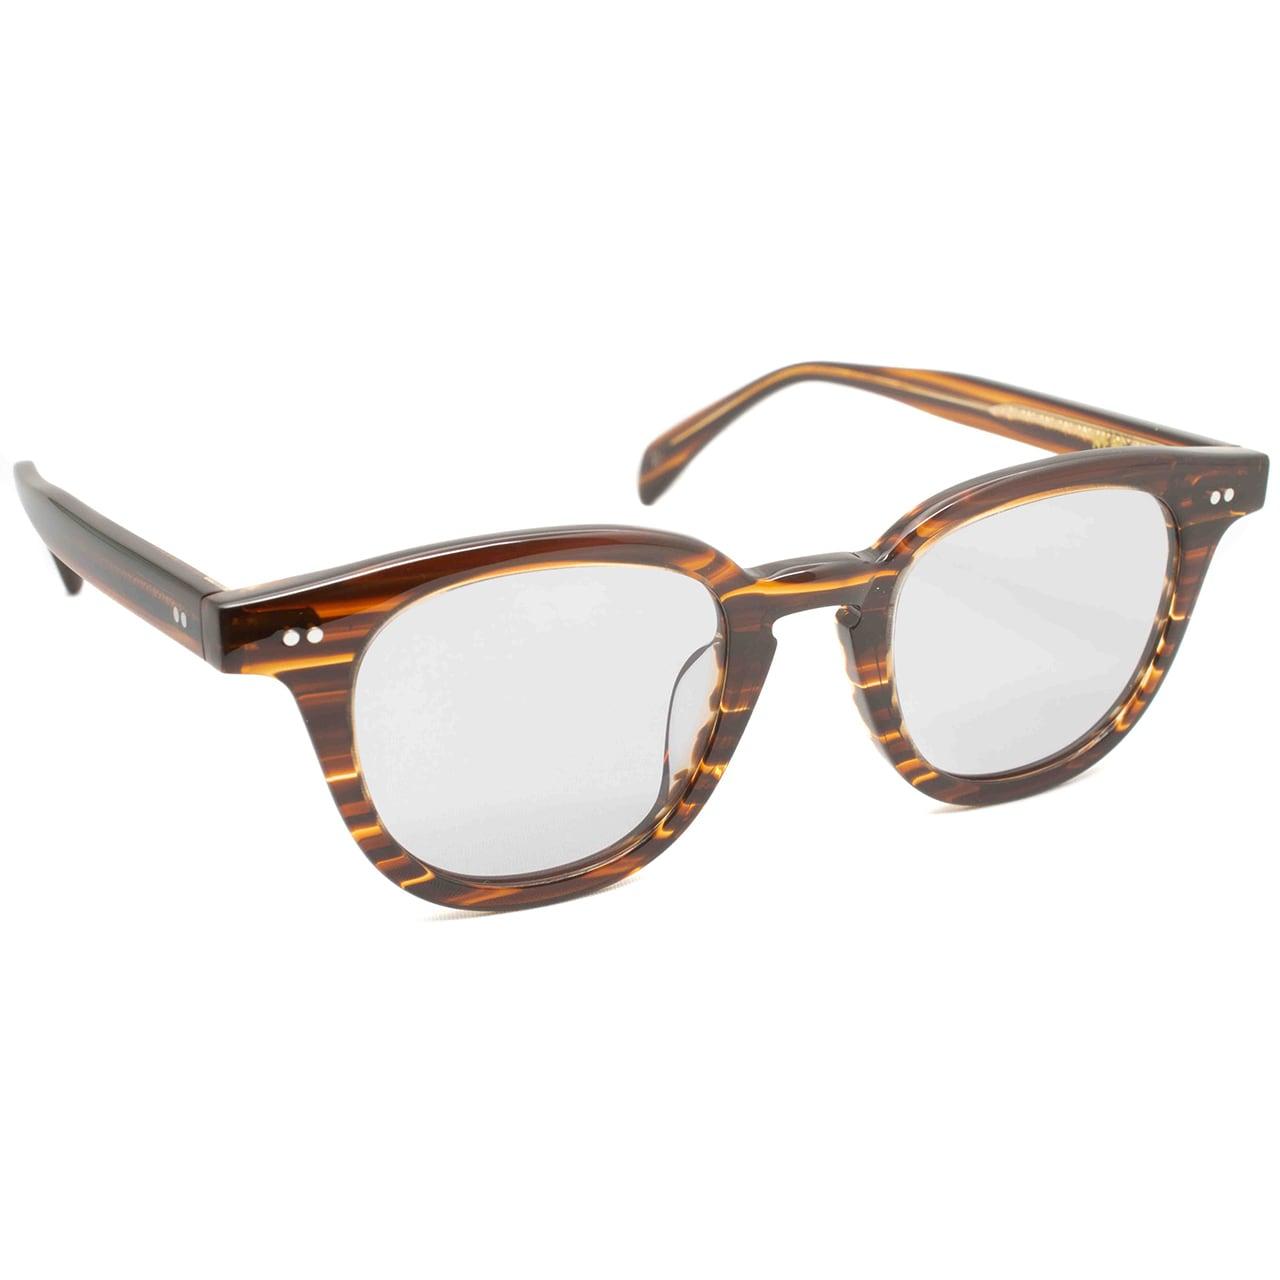 NEW.(ニュー) 眼鏡 (サングラス) 【 FIELDS C-2】【brown sasa】